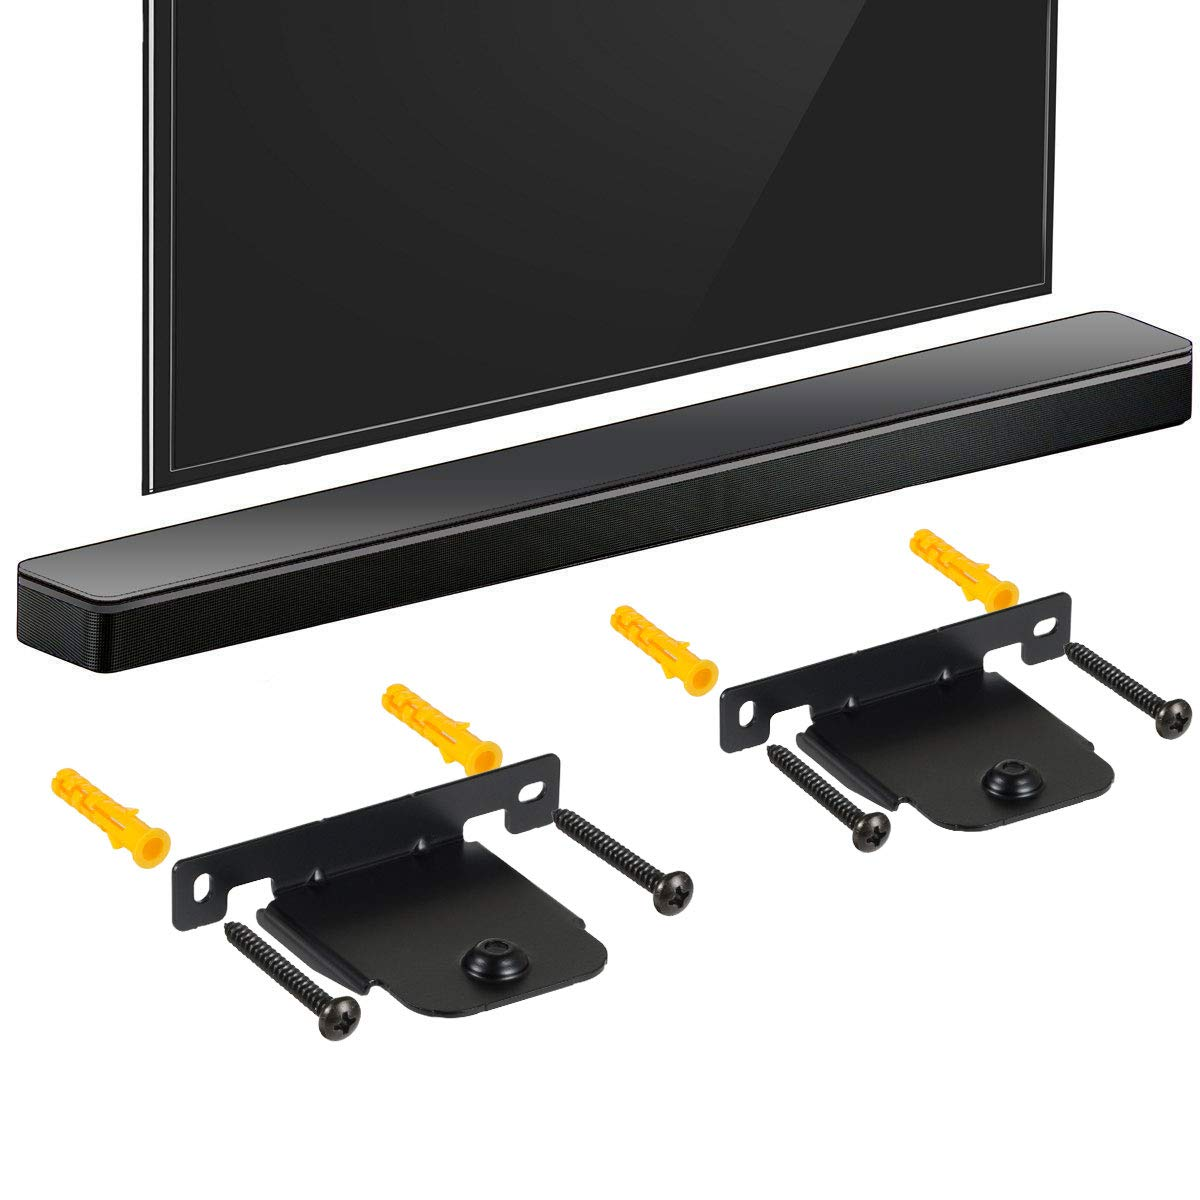 ECLINK Soundbar Wall Brackets for LG SH4 SJ4R SJ4 SK4D SJ5B SH8 SJ8S SH5 HS7 SJ6 LAS455H NB5540//S54A1-D NB4540//S44A1-D NB4542DEUSLLF LAS551H S55A1-D LASC55 with Screws